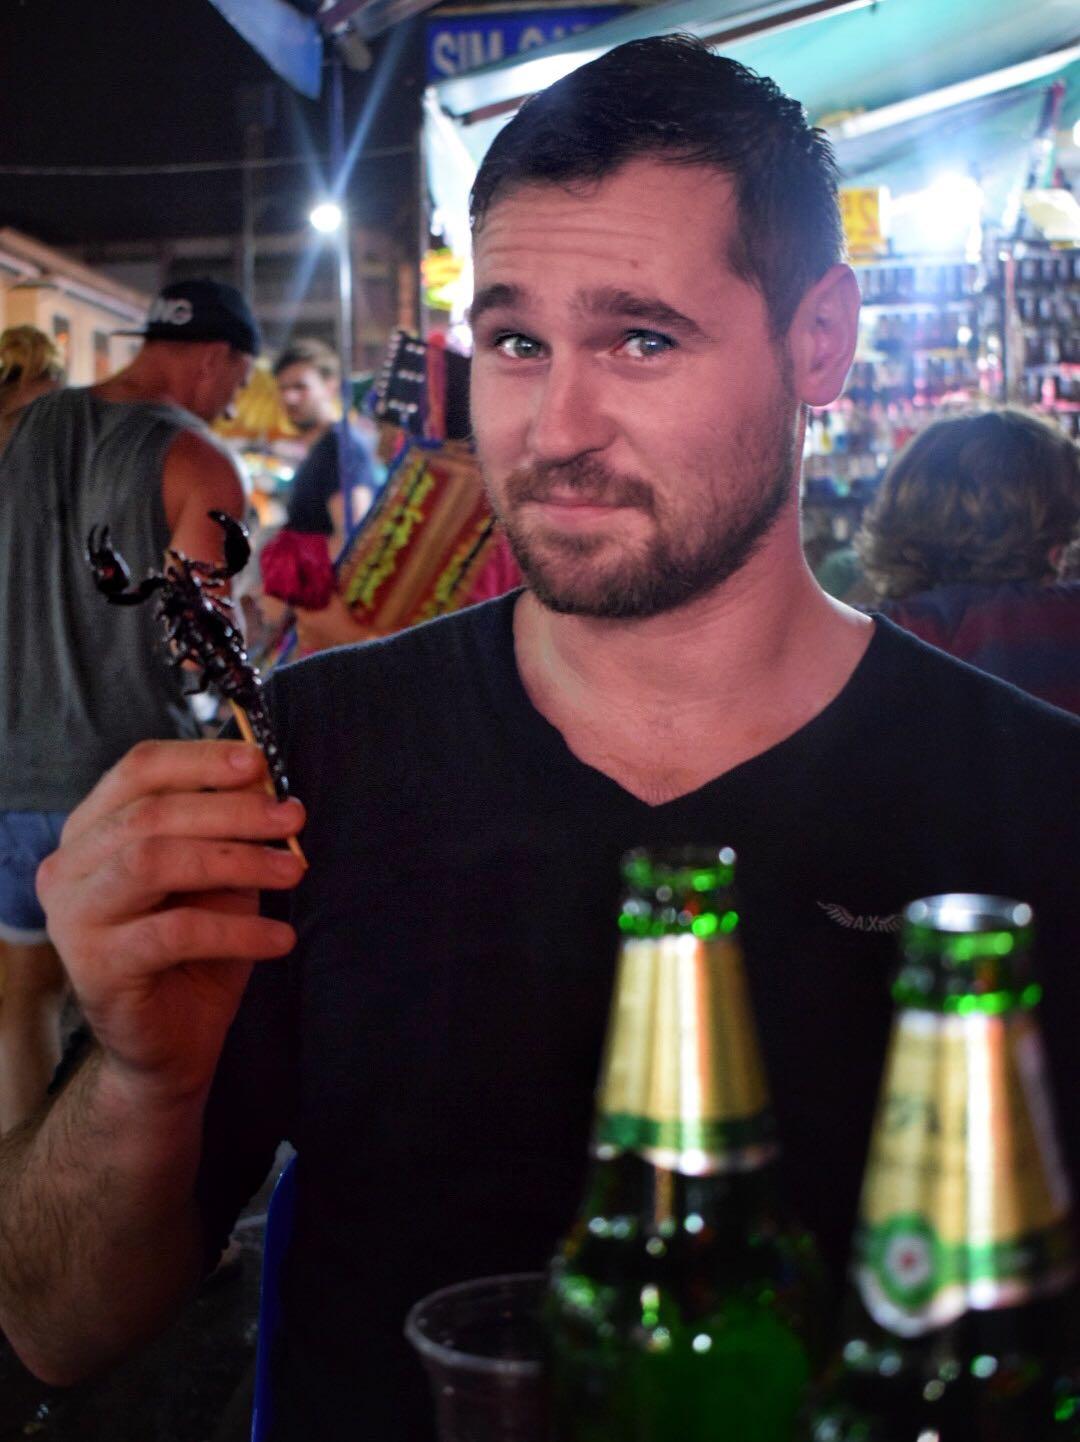 Tourist eating scorpions on Khao San Road in Bangkok, Thailand